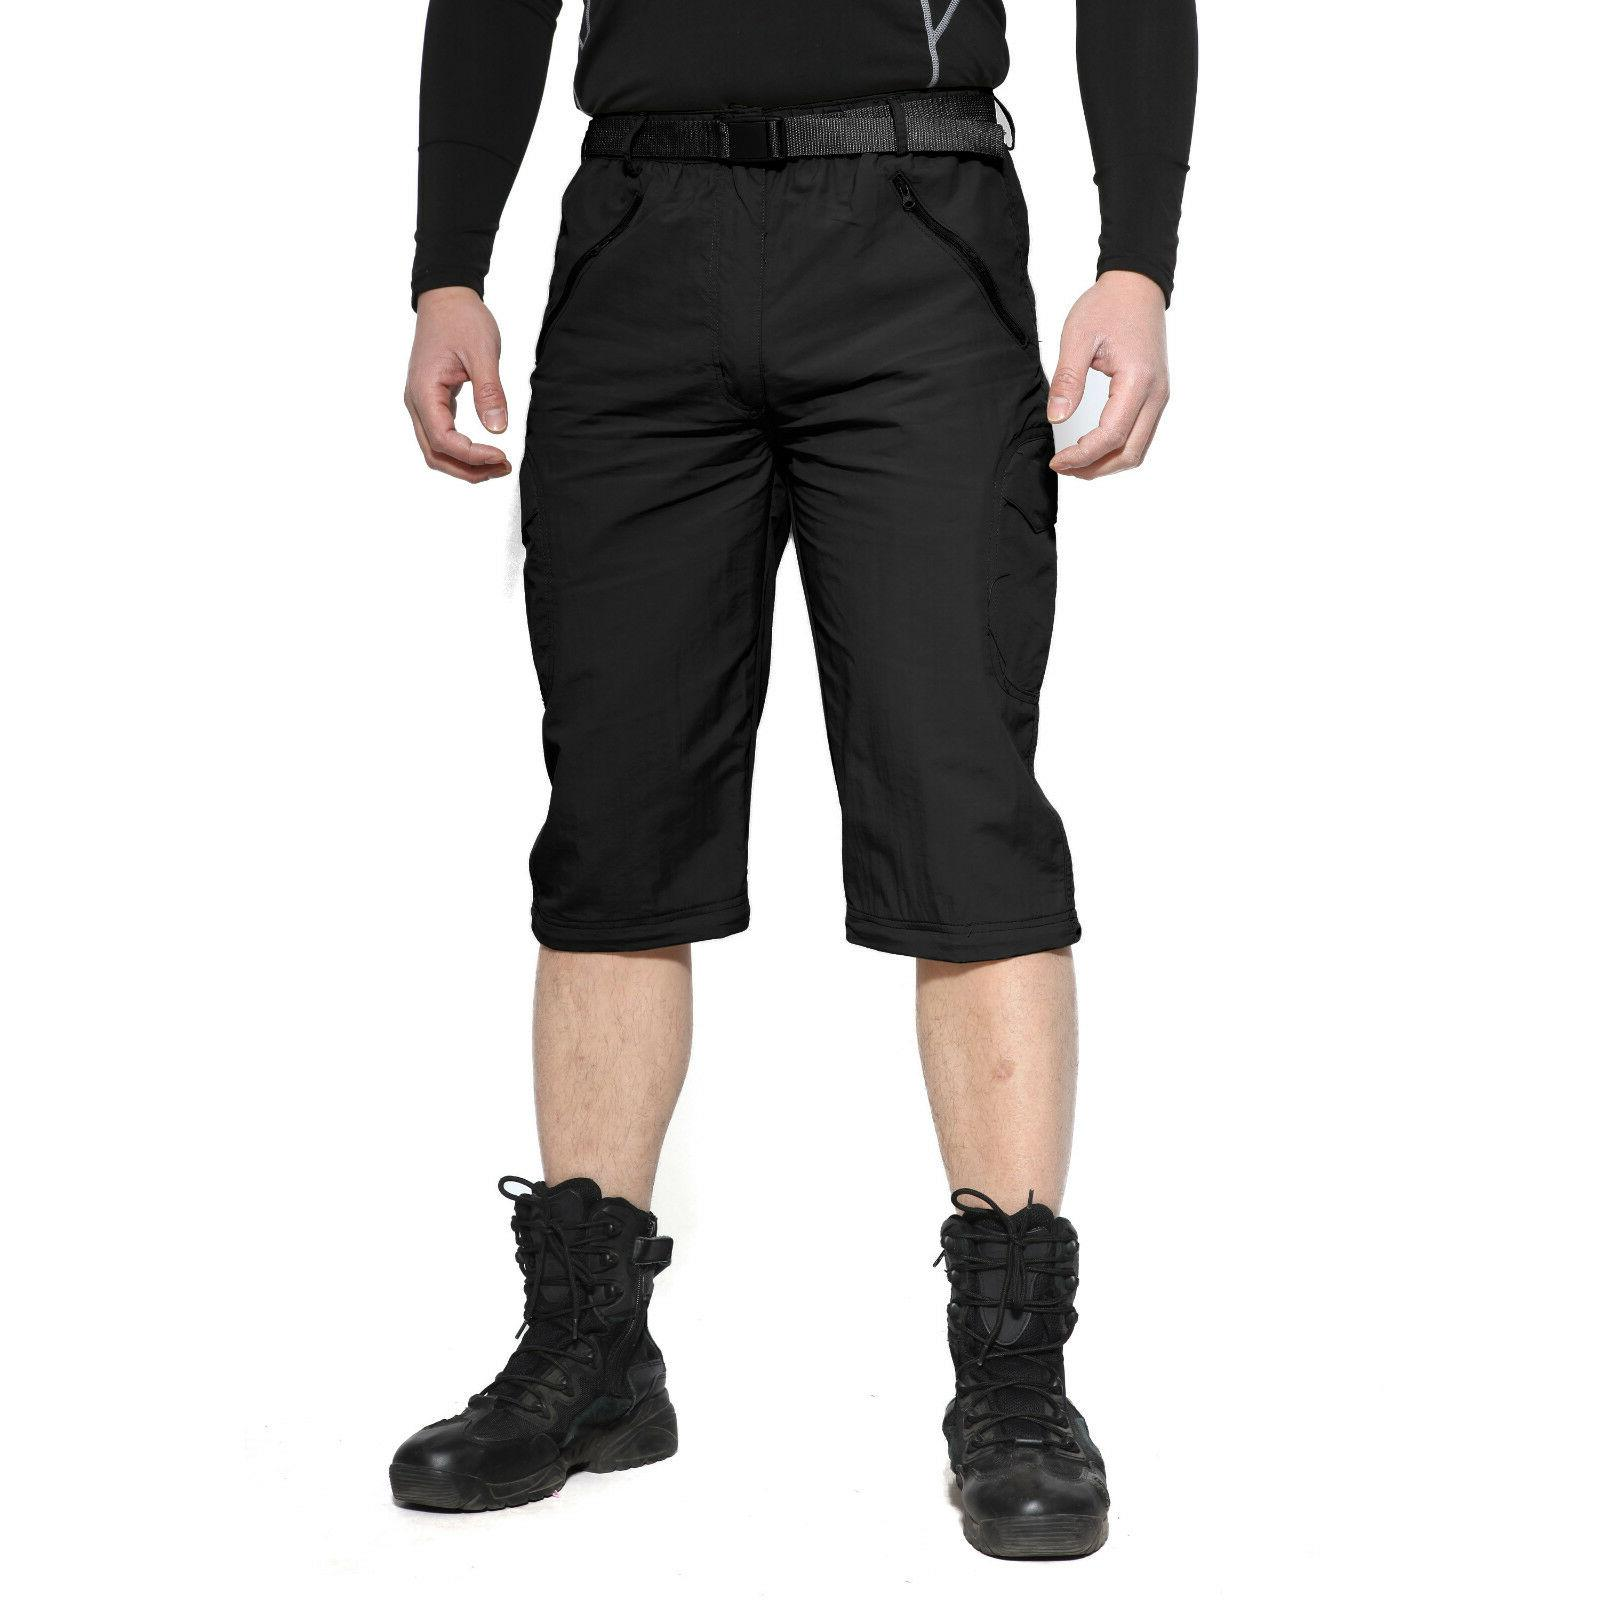 TACVASEN Drying Anti-Rip Hiking Trousers Pants